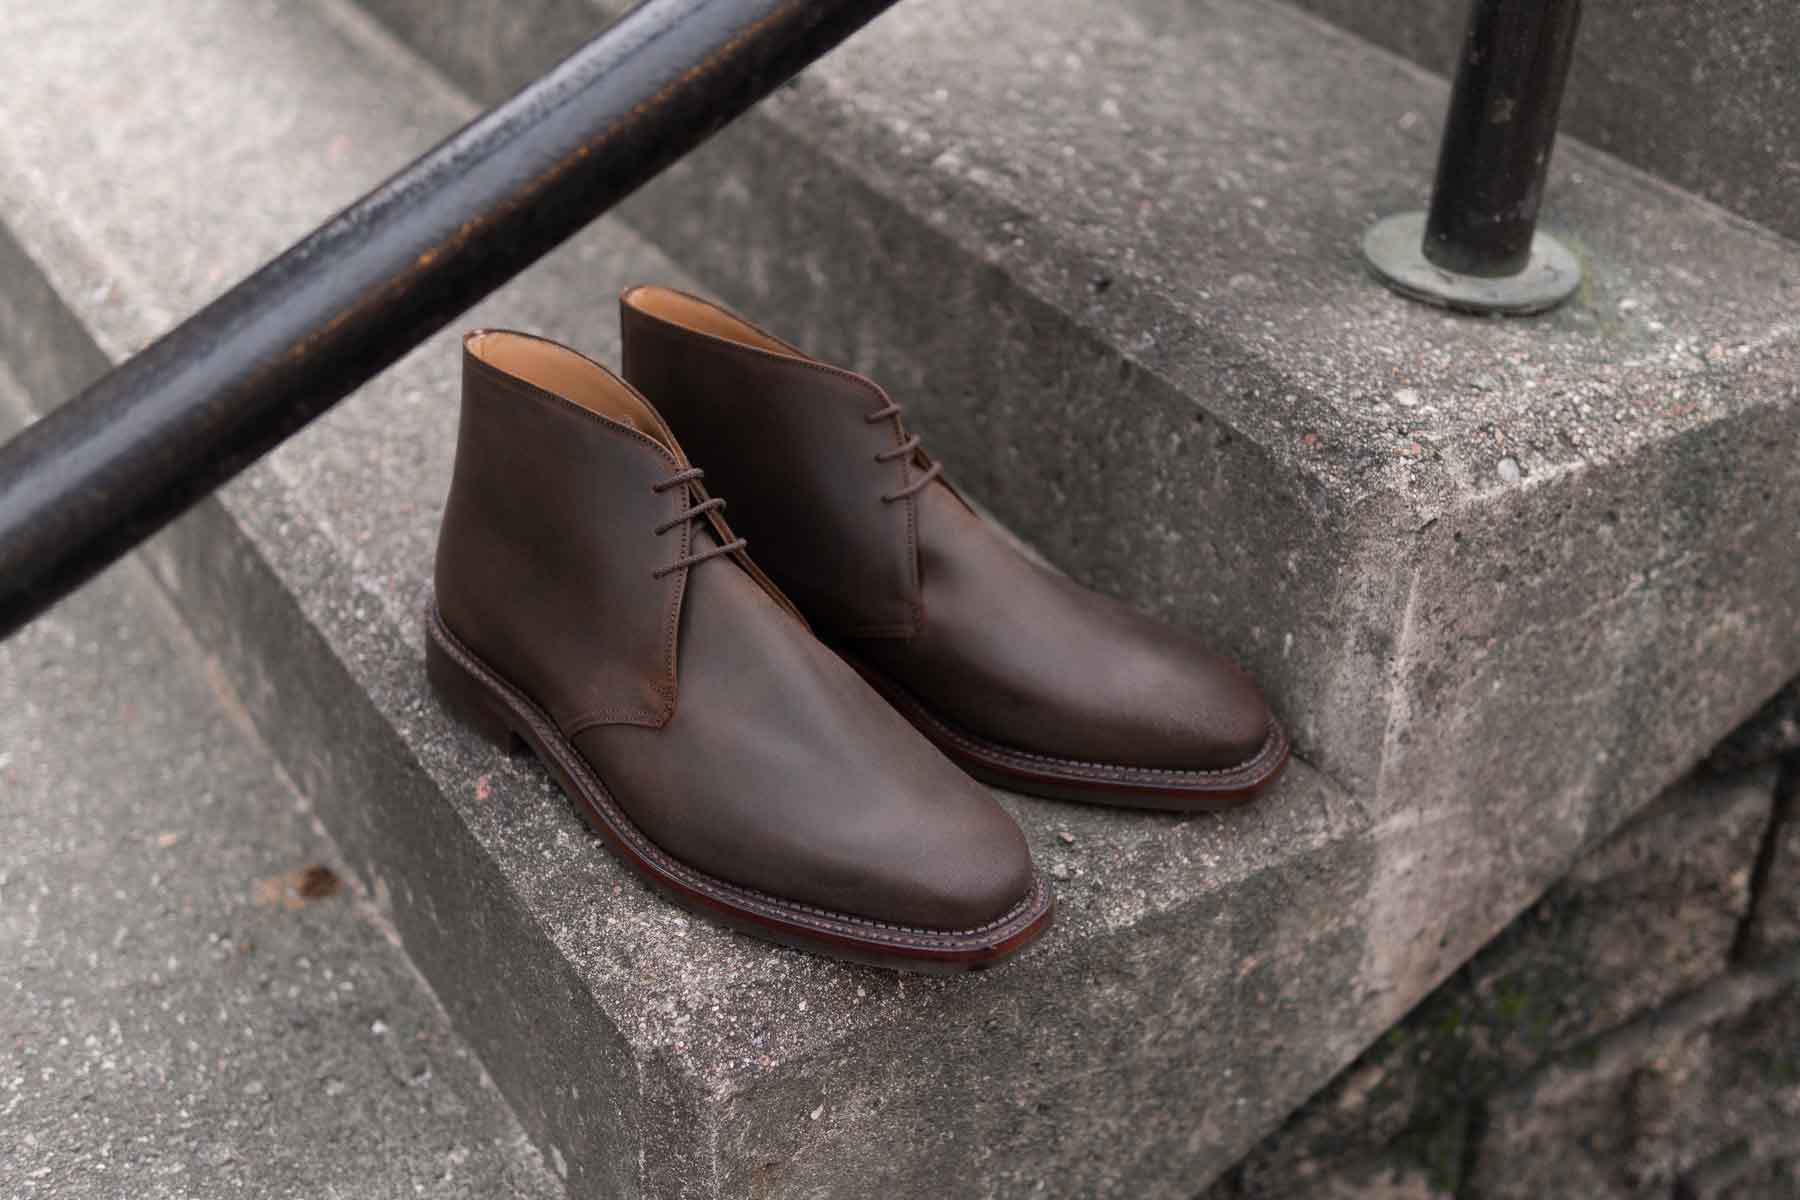 Crockett & Jones Molton Chukka Boots for The Noble Shoe